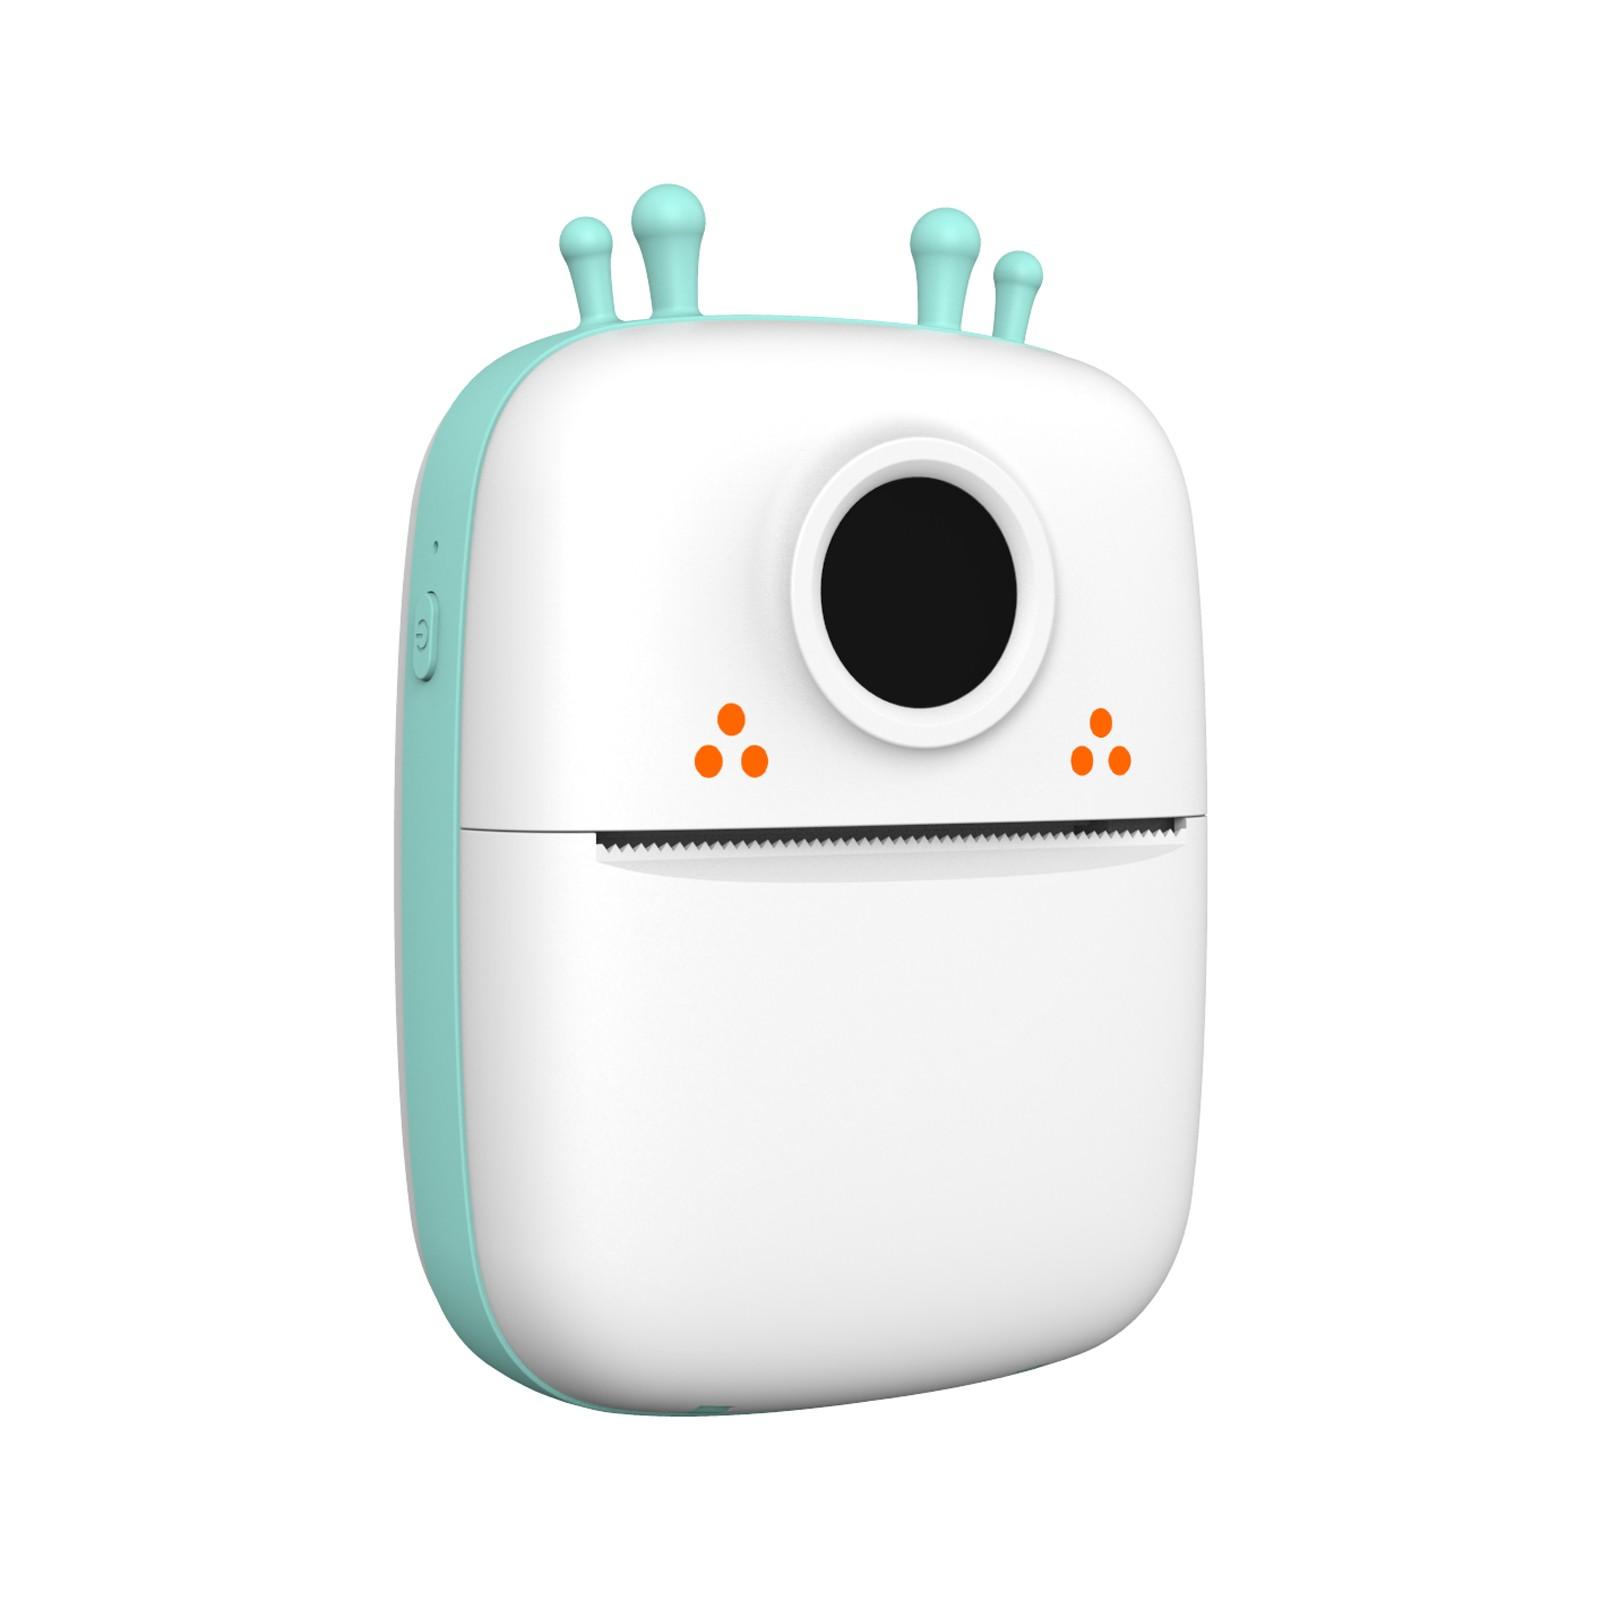 Tomtop - 37% OFF Mini Portable Printer BT Wireless Photo Printer, Free Shipping $22.49